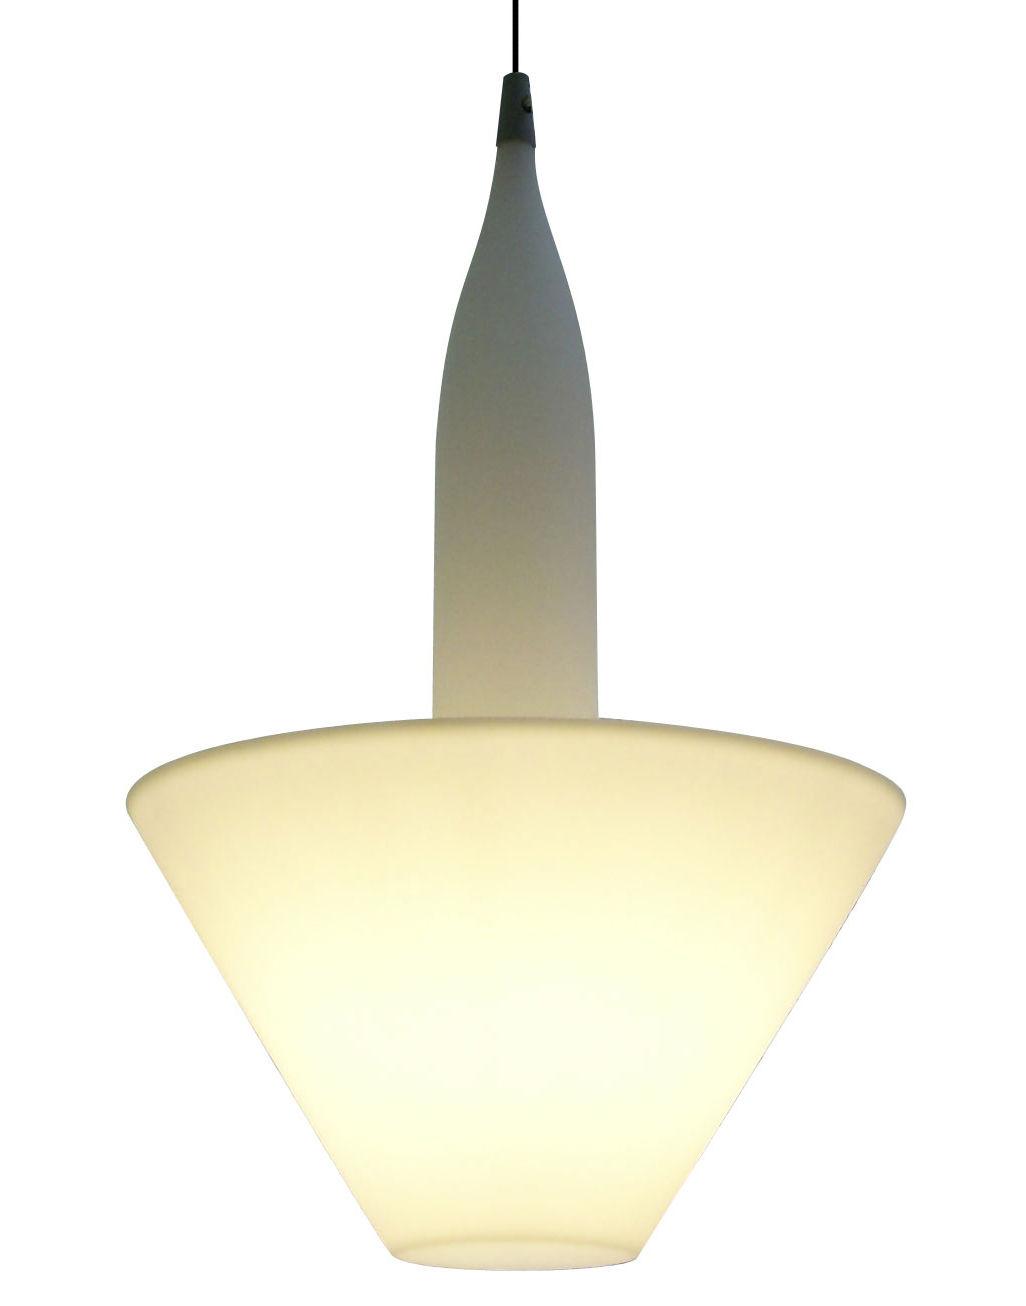 Lighting - Pendant Lighting - Bonheur Pendant by Serralunga - White - Polythene